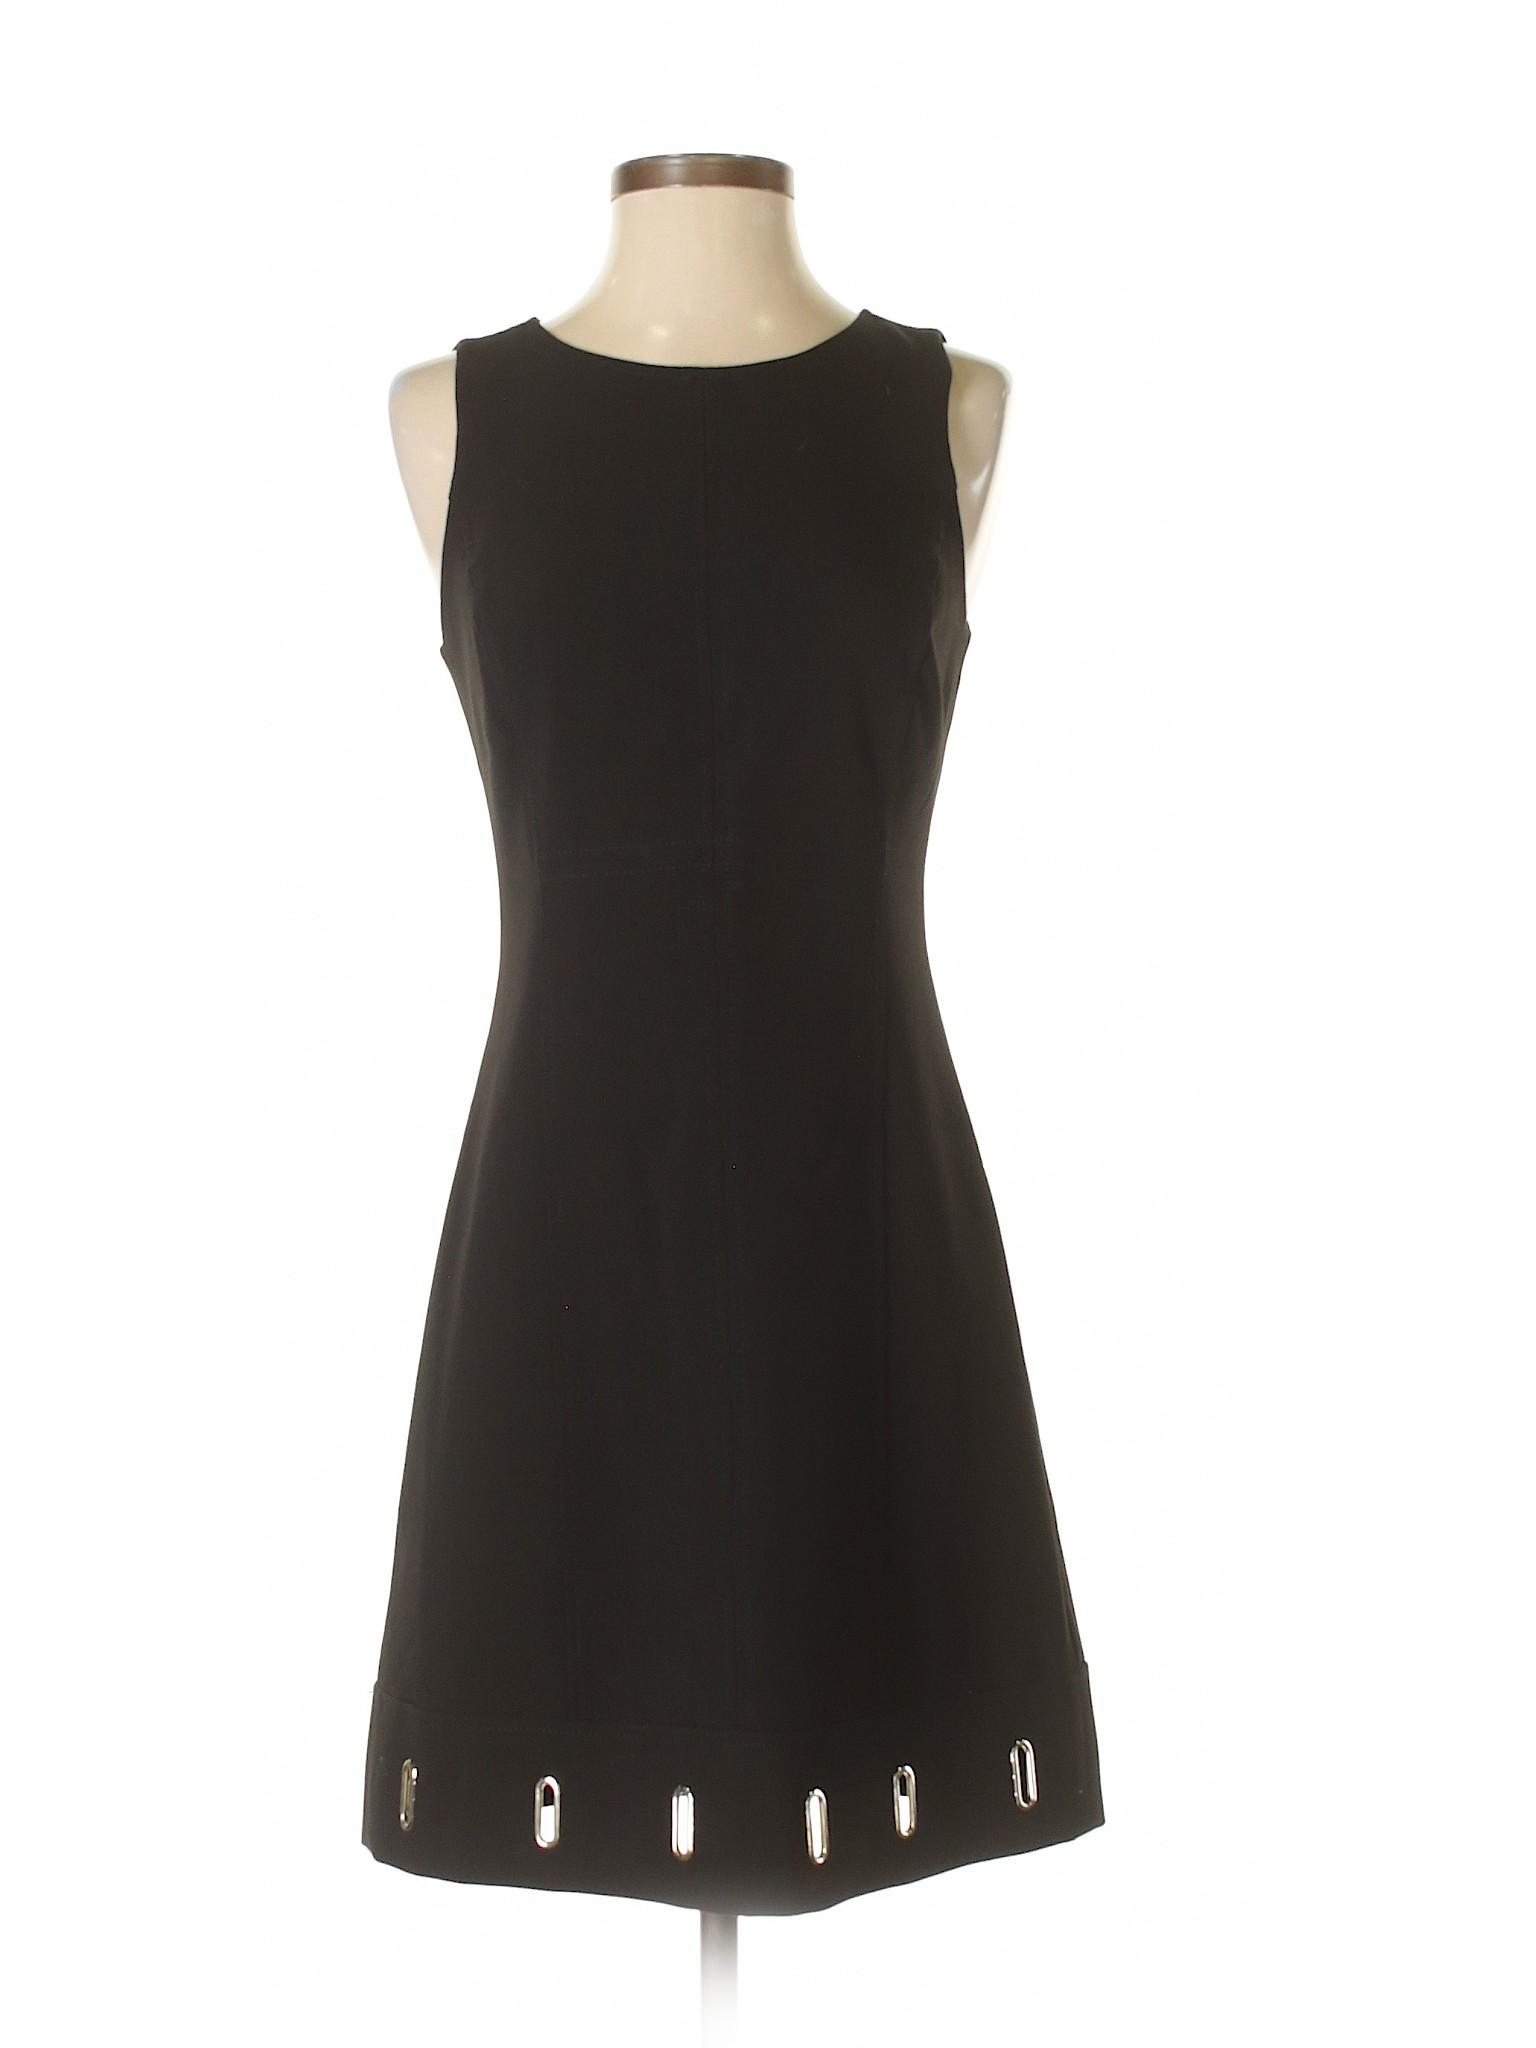 Dress Black Casual winter Boutique House White Market gx8Fz